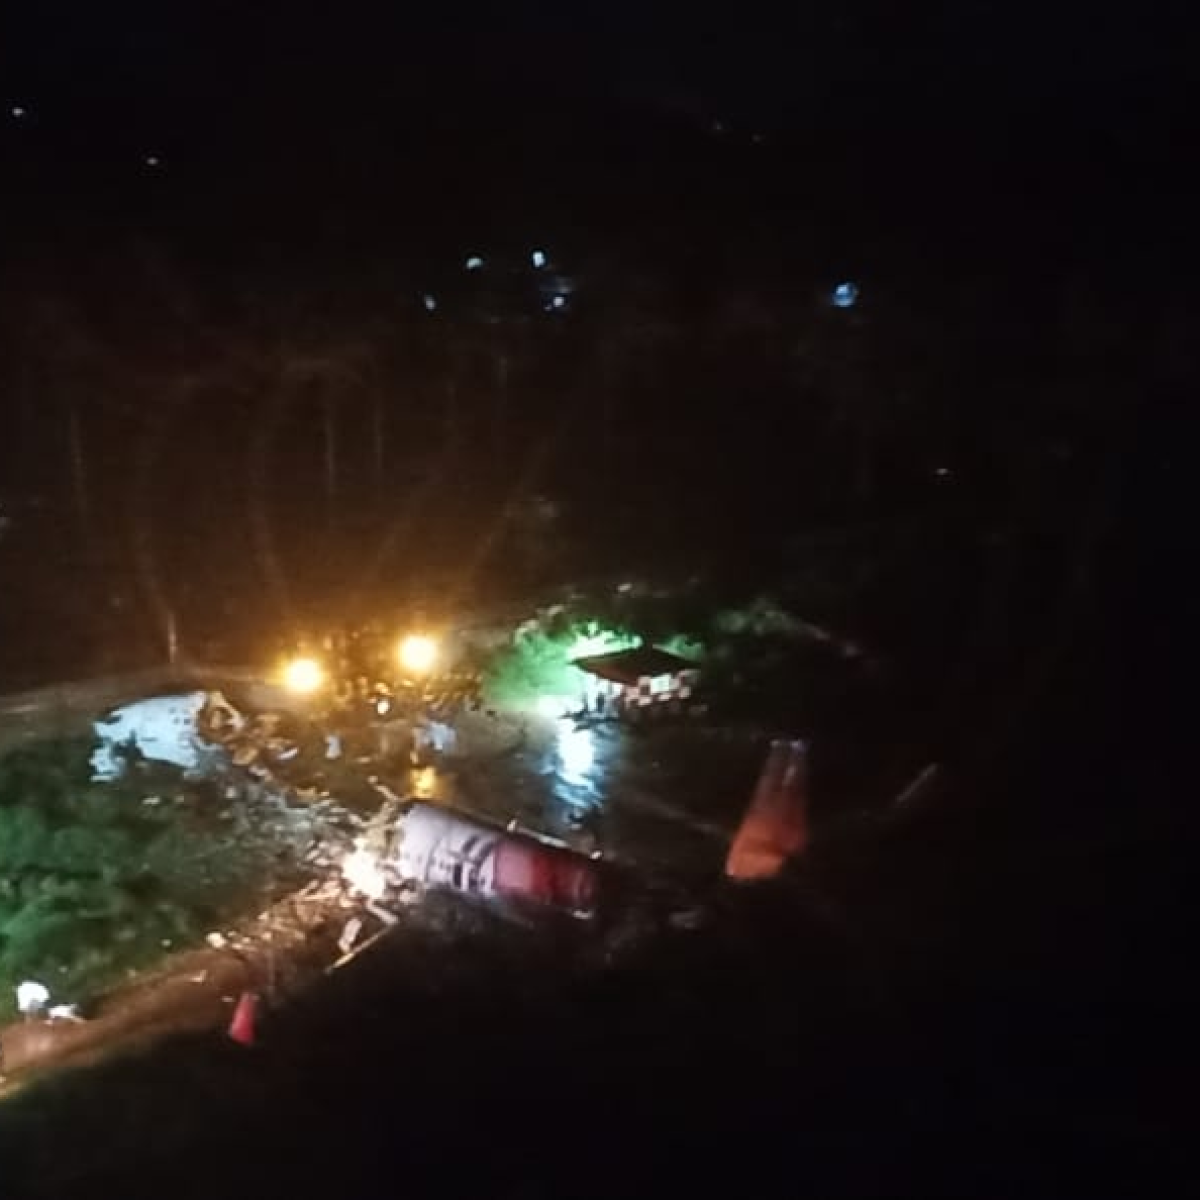 Calicut Air India Plane Crash: Amit Shah, Rahul Gandhi and others 'shocked at the devastating news'